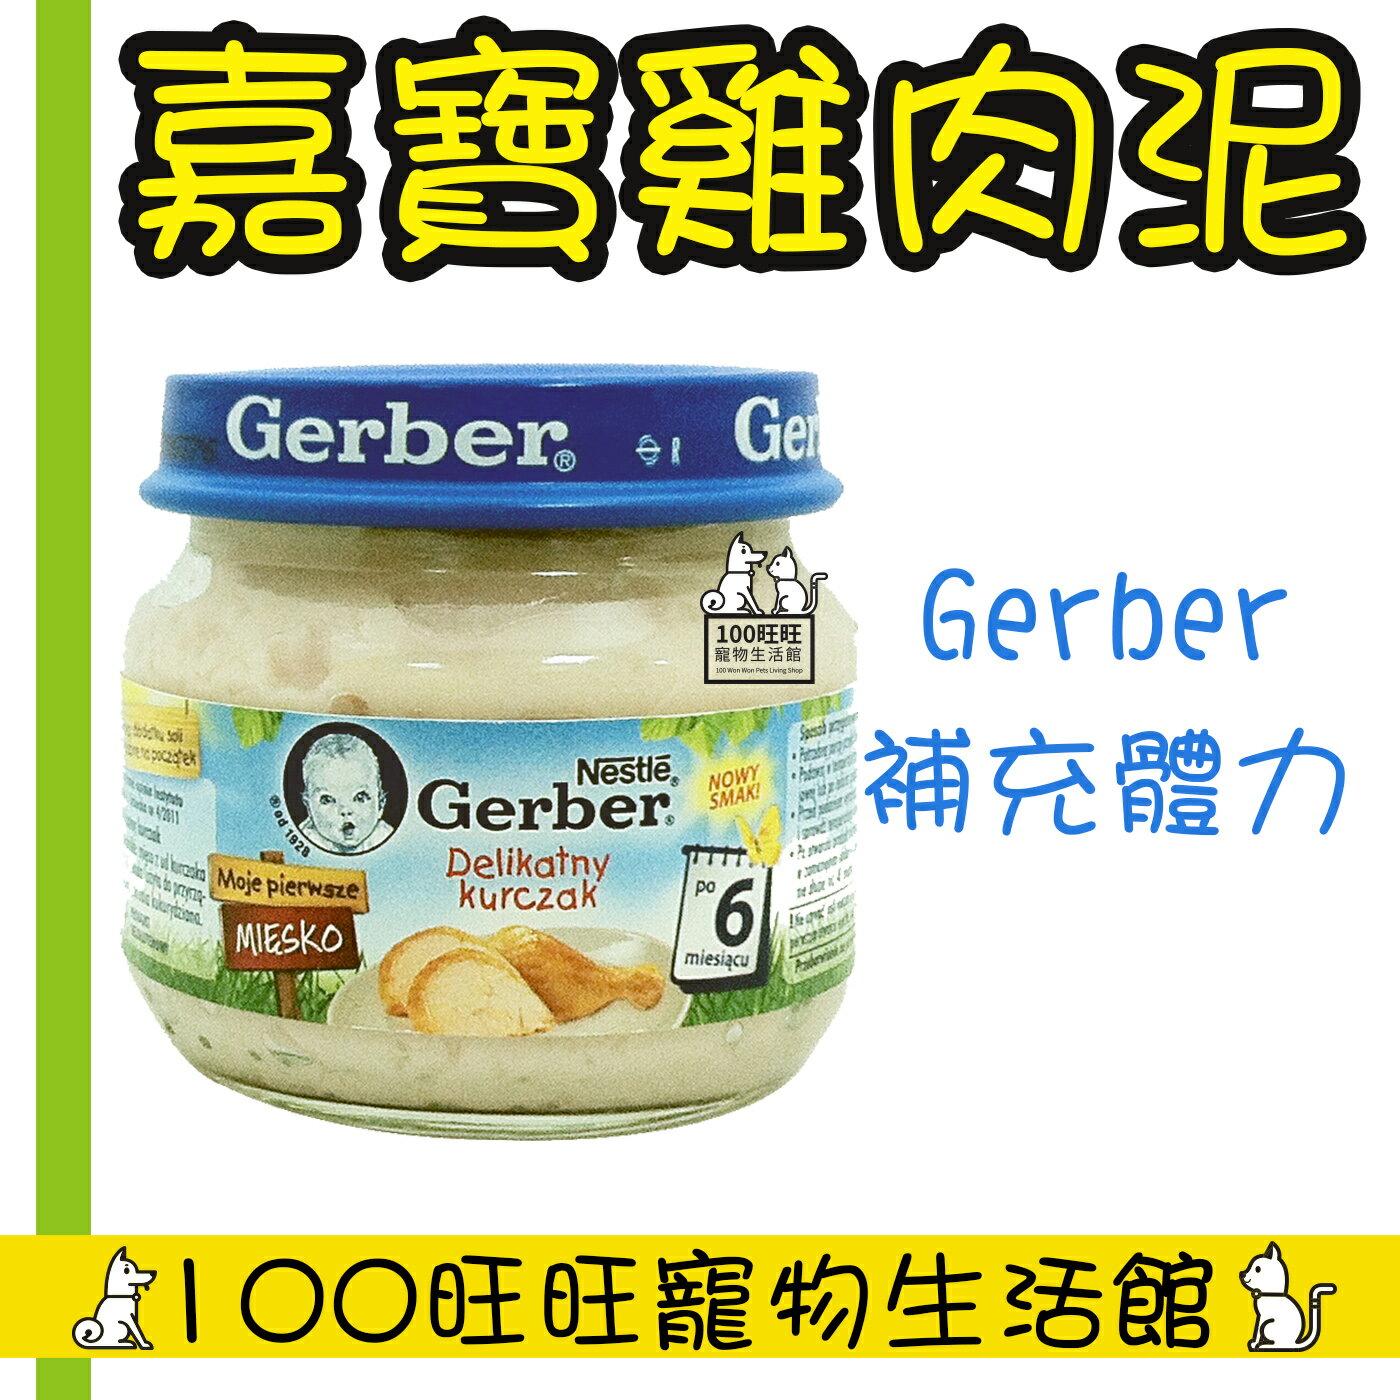 Gerber嘉寶 Babyfood 純鮮雞肉泥 71g